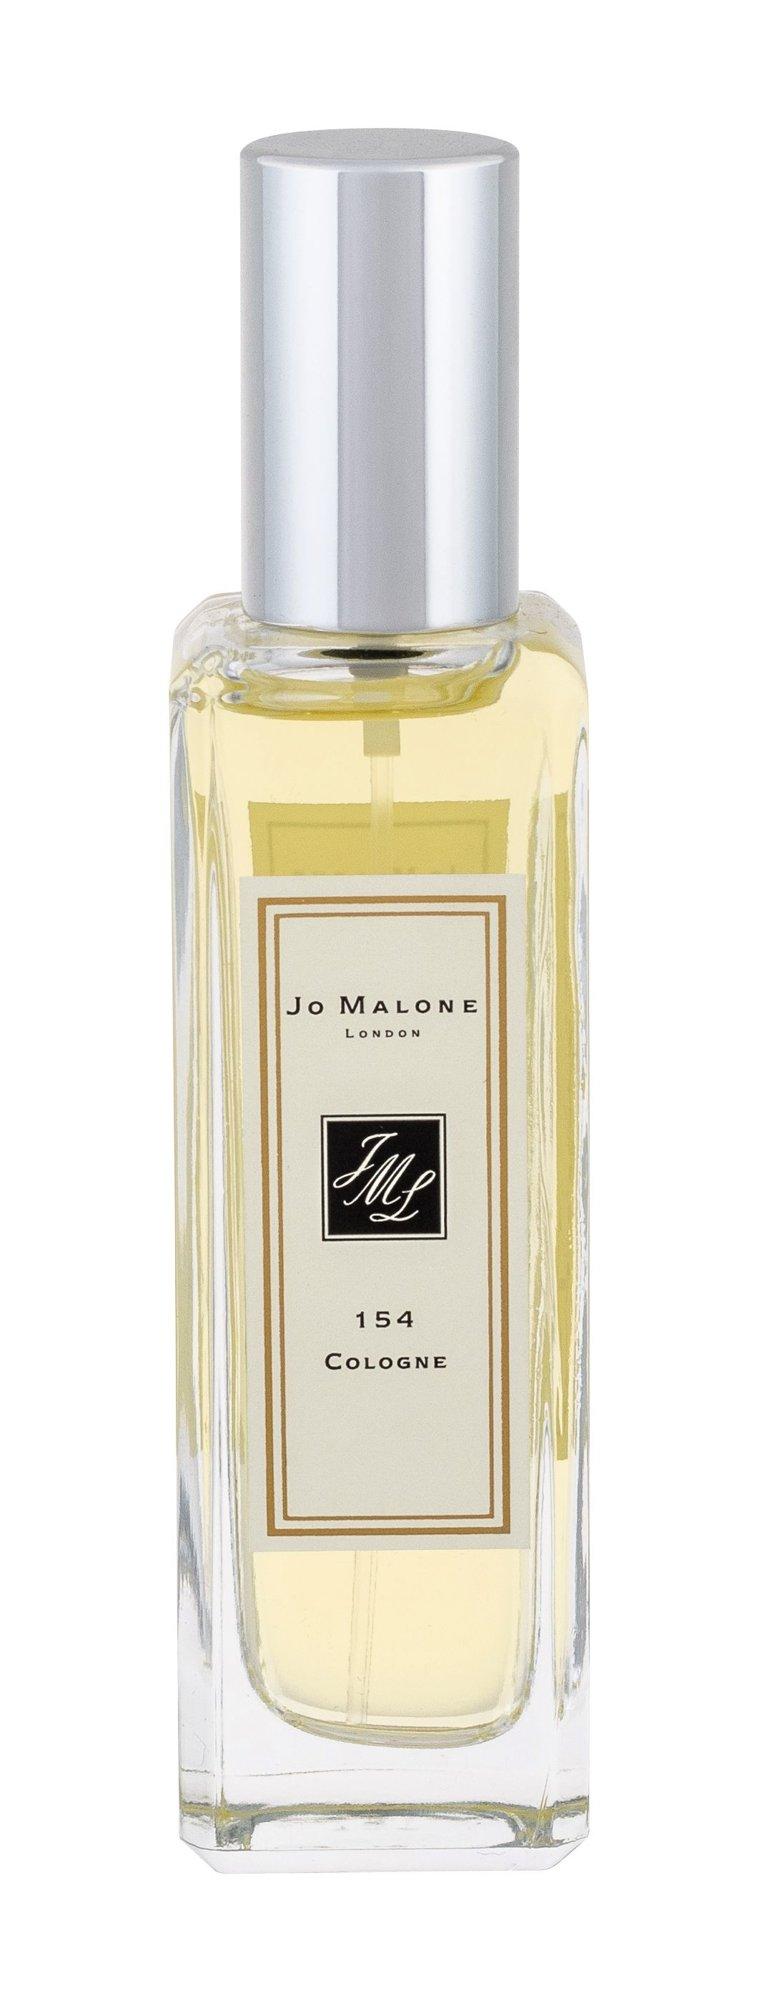 Jo Malone 154 Eau de Cologne 30ml